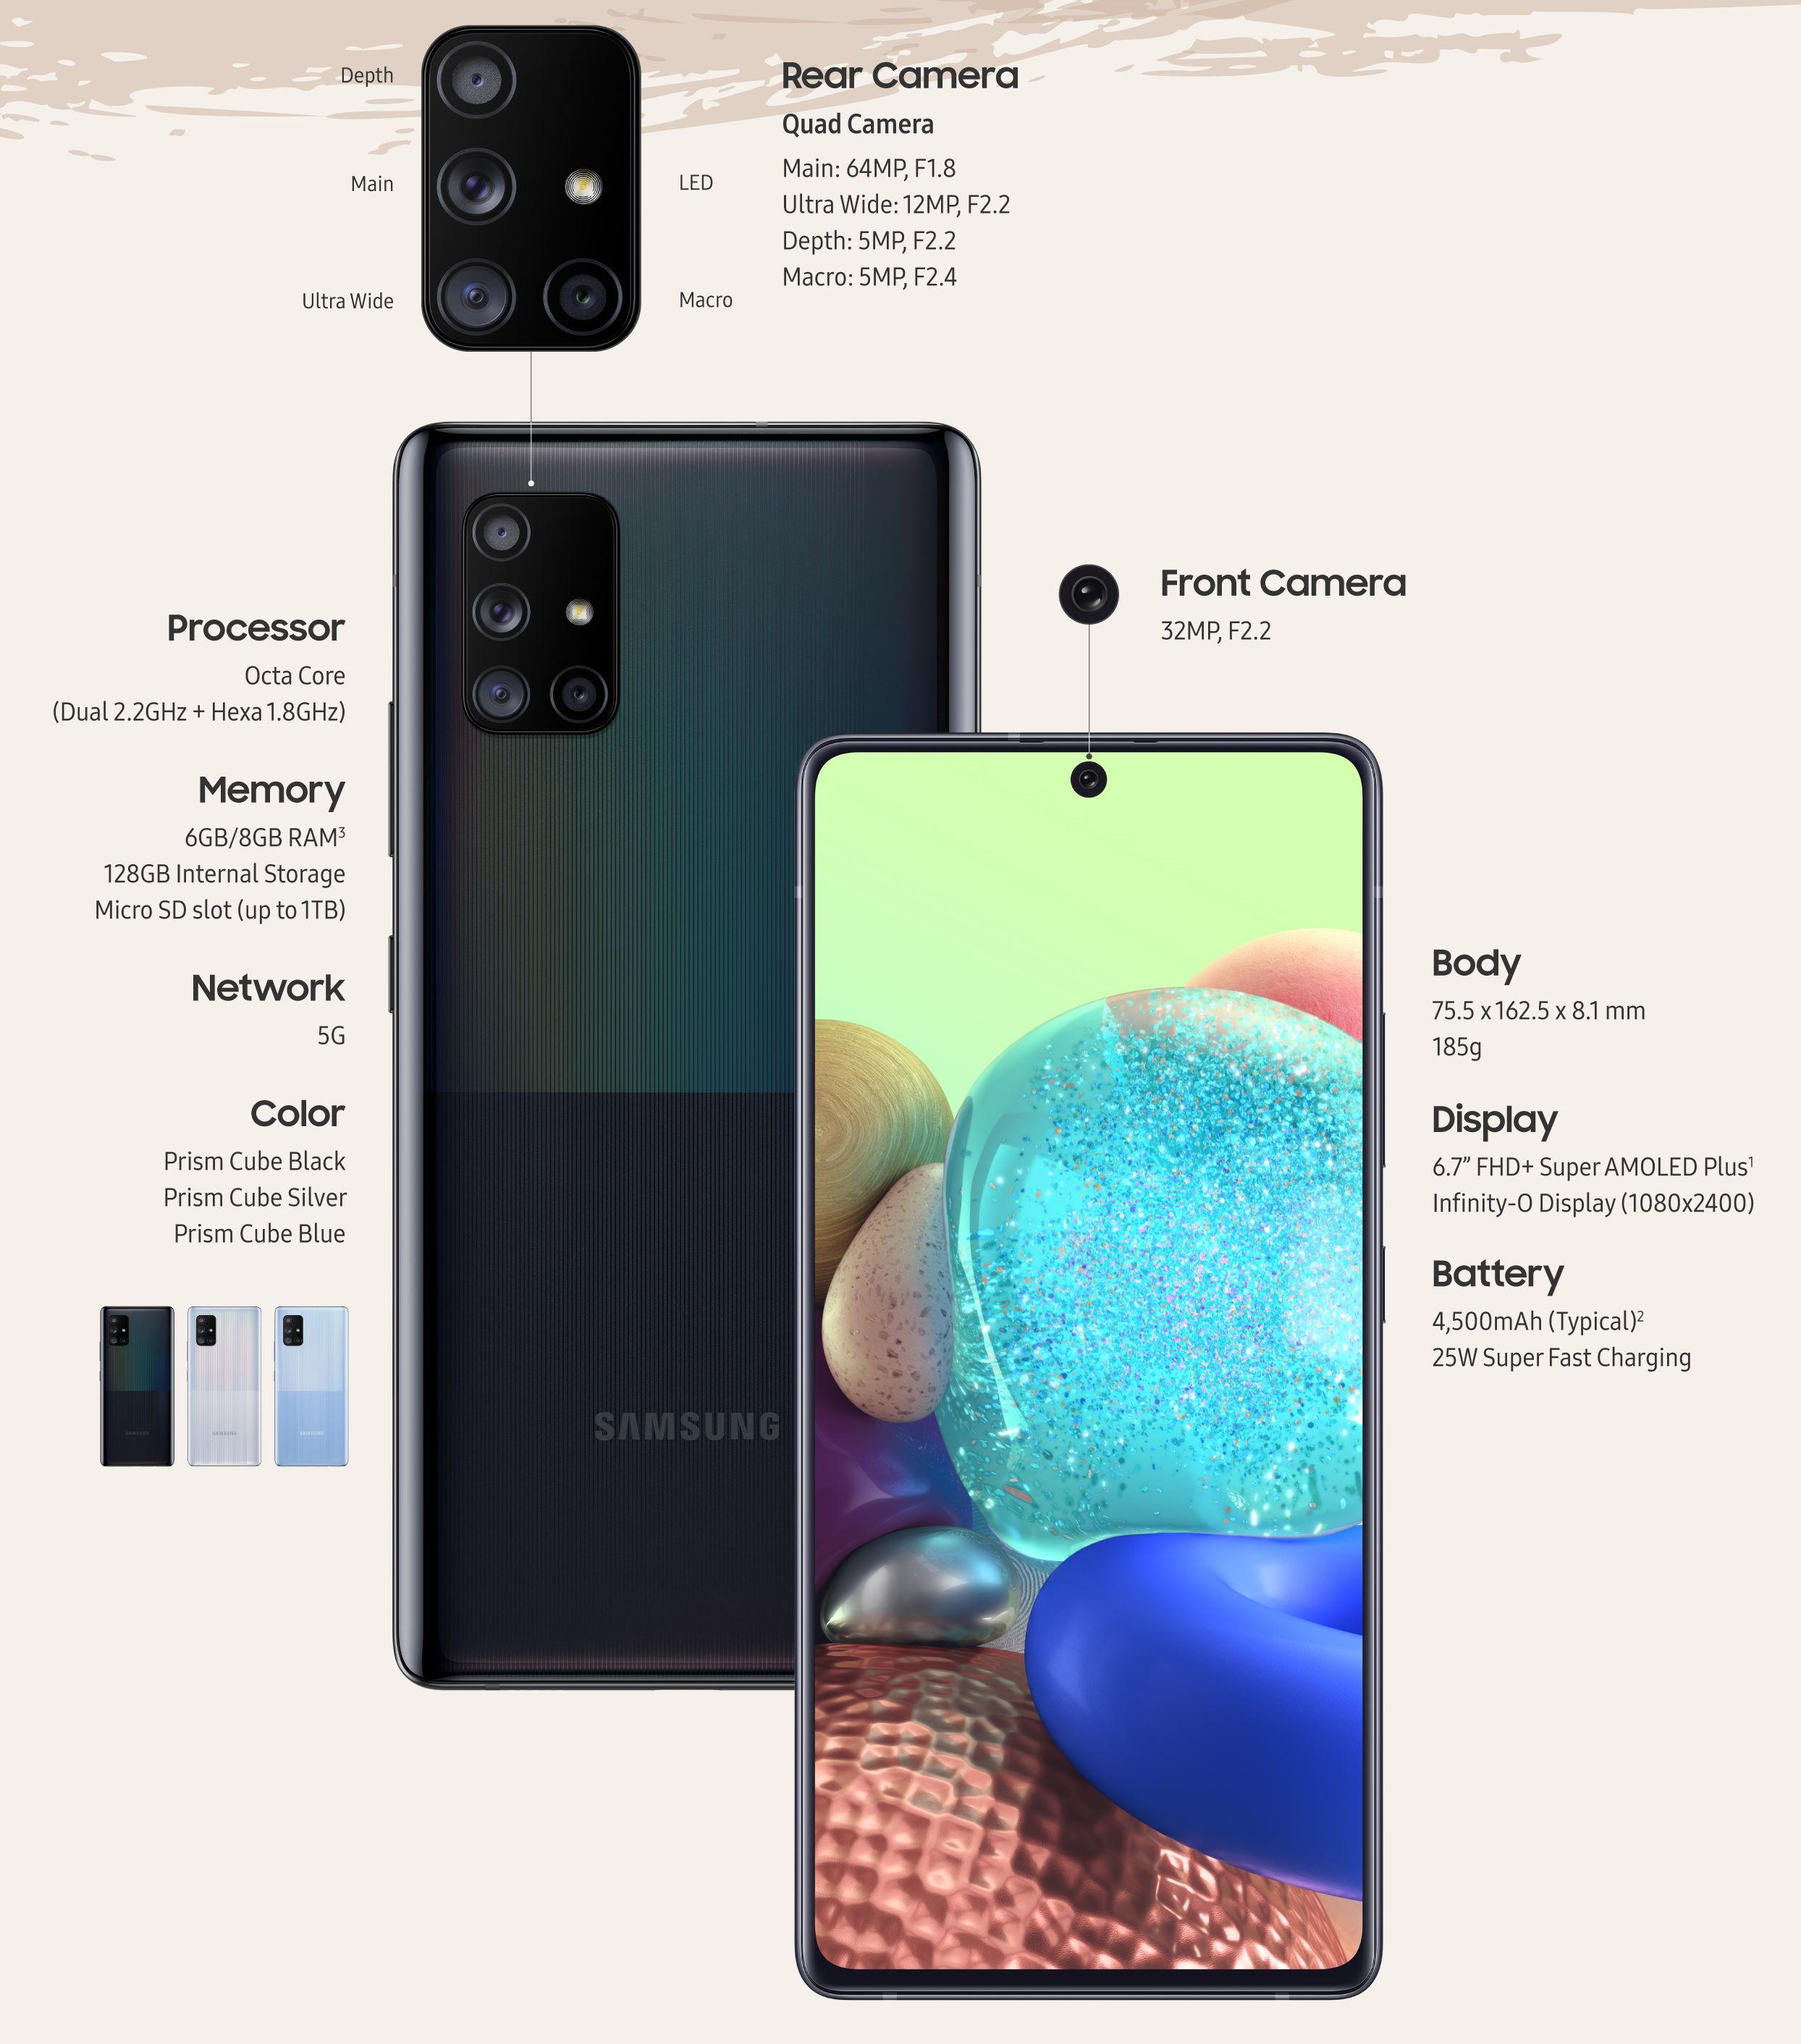 Samsung Announces Galaxy A51 5g A71 5g Mid Range Smartphones